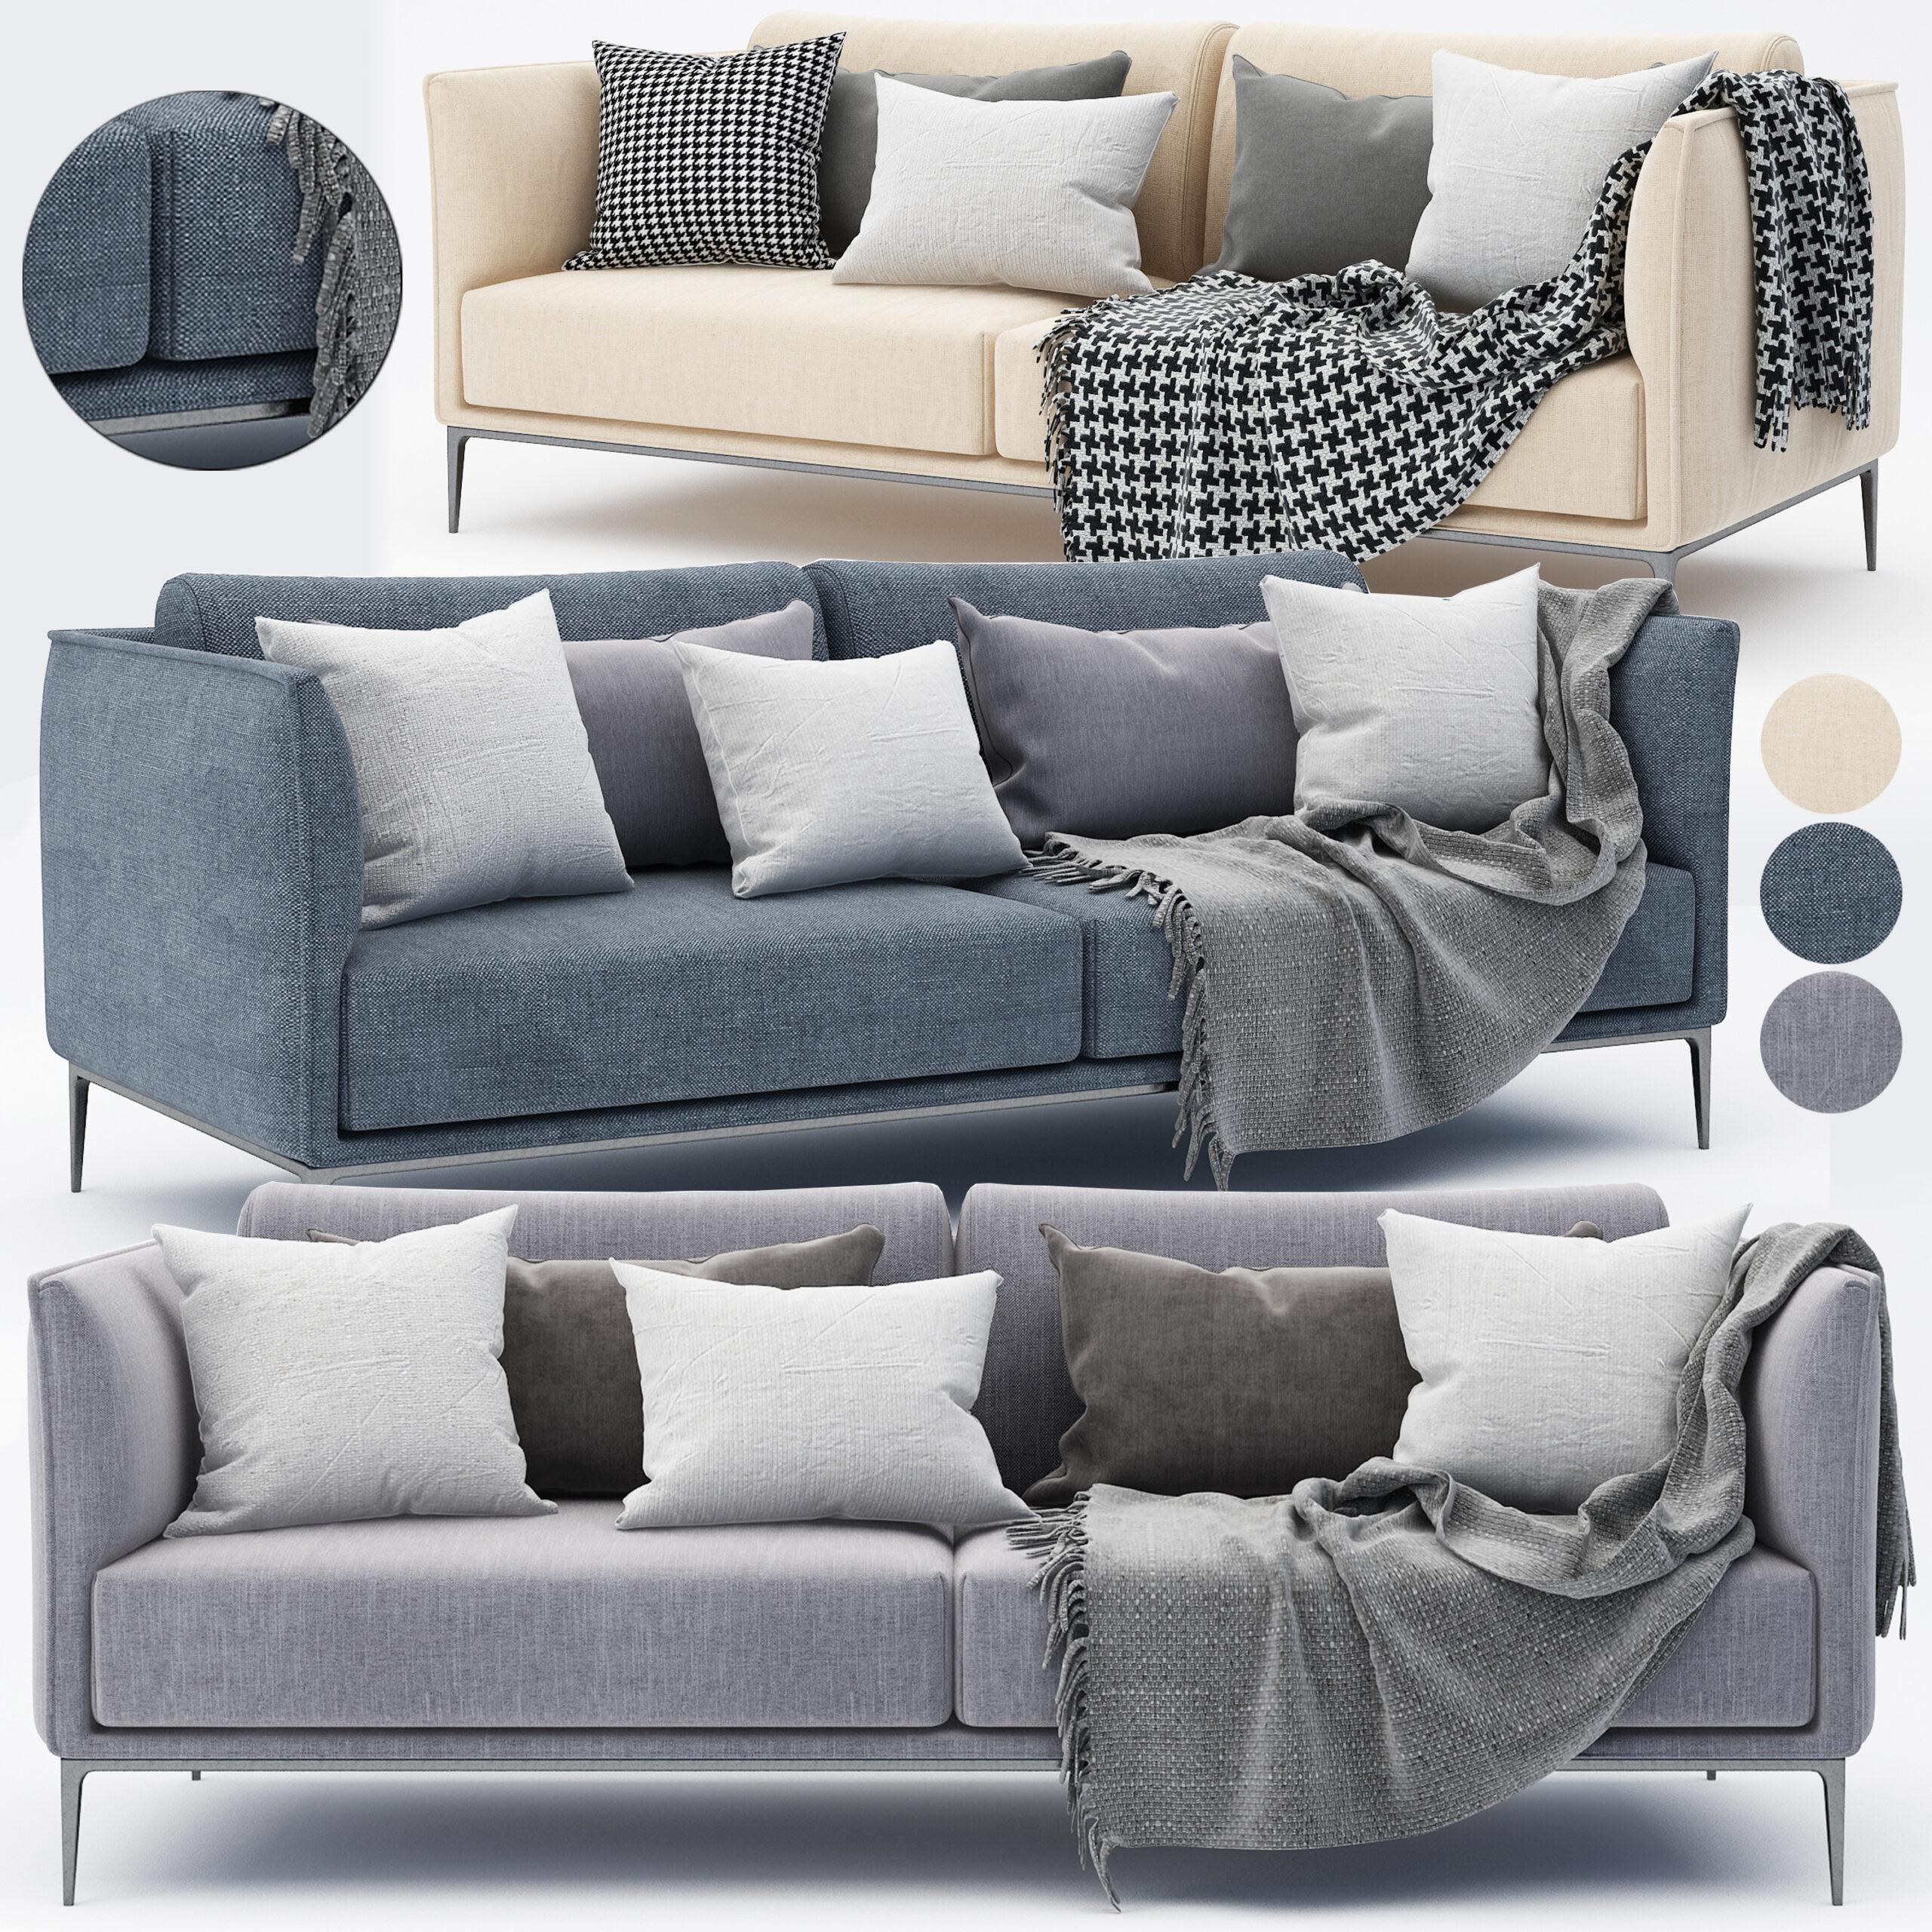 Full Size of Modernes Sofa 3d Modell Turbosquid 1493475 Boxspring Vitra Home Affaire Big Federkern Ewald Schillig Mit Schlaffunktion Halbrundes 2 Sitzer Rund Relaxfunktion Sofa Modernes Sofa